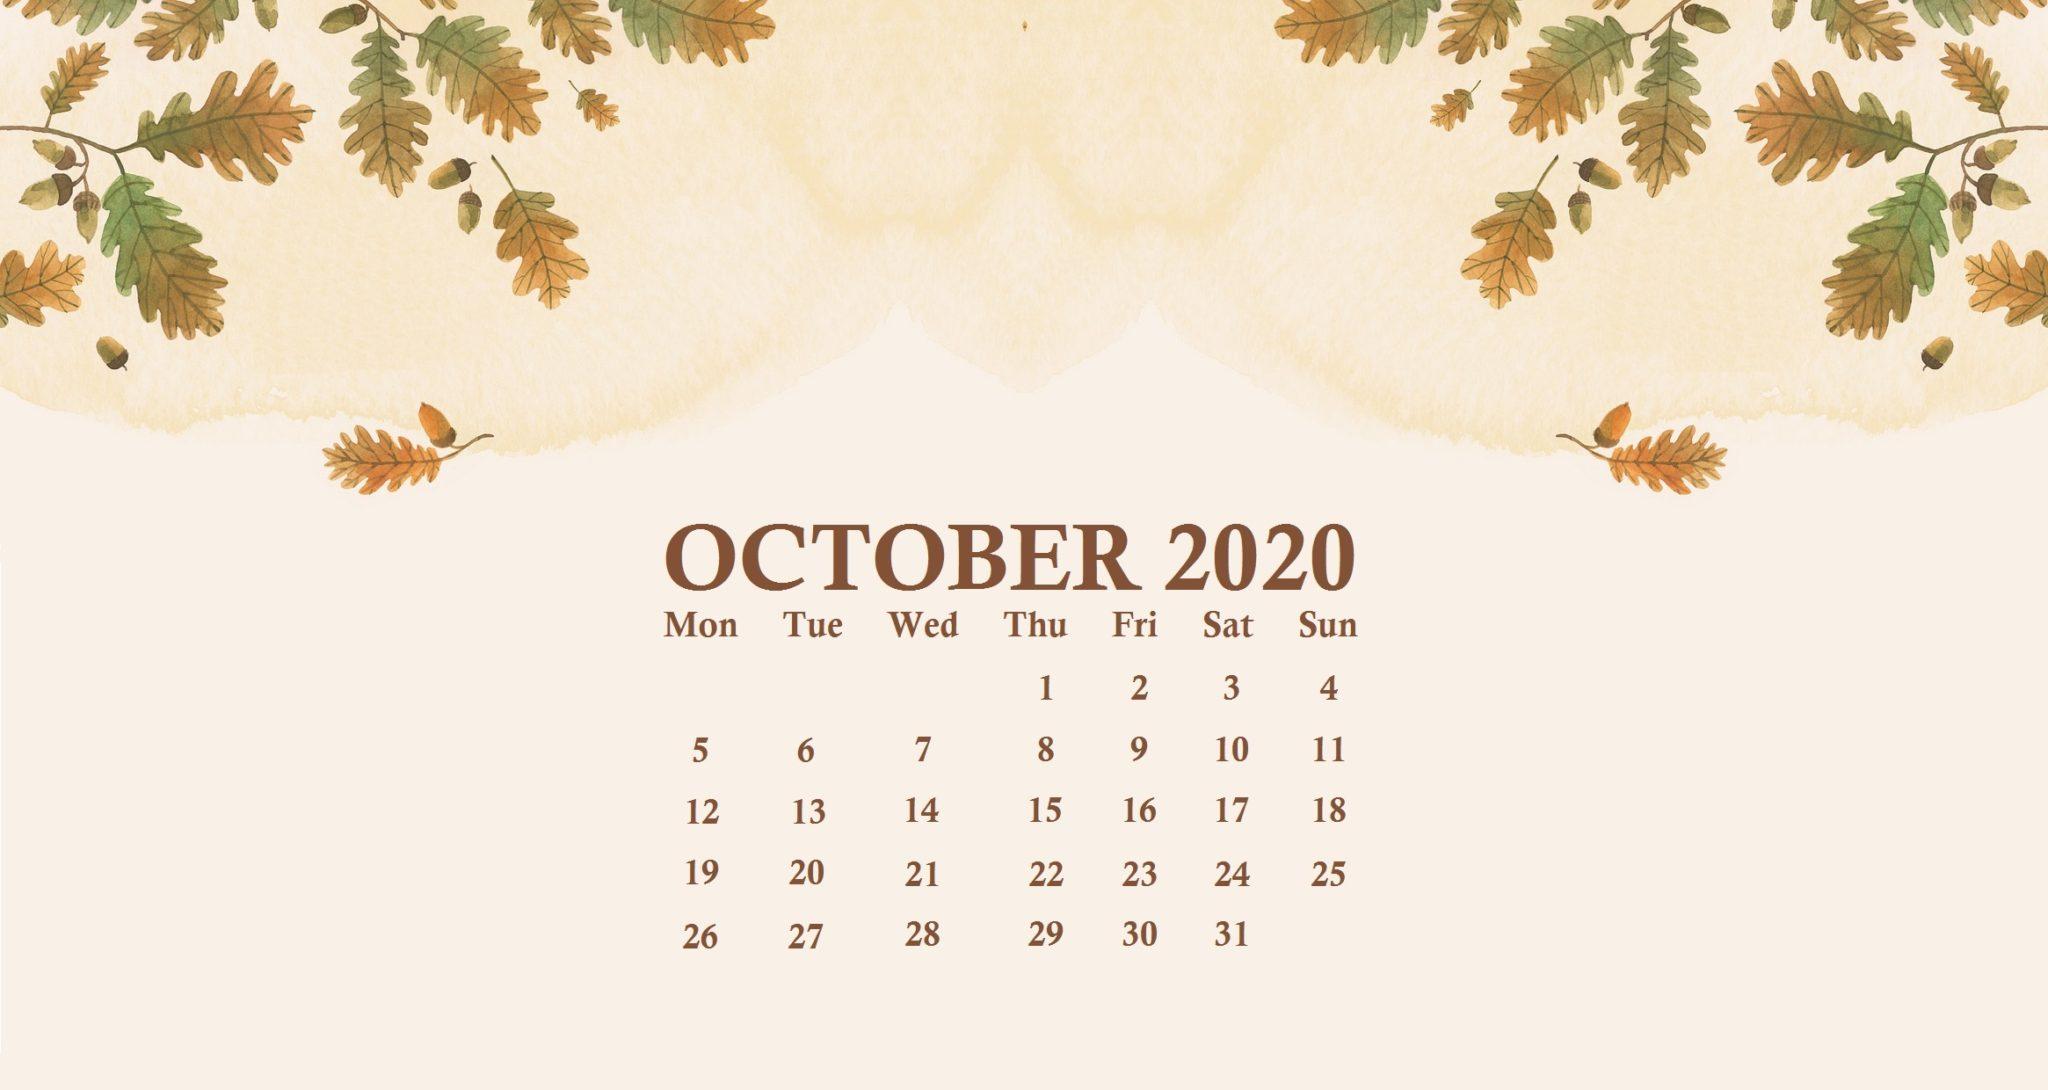 October 2020 Calendar Wallpaper